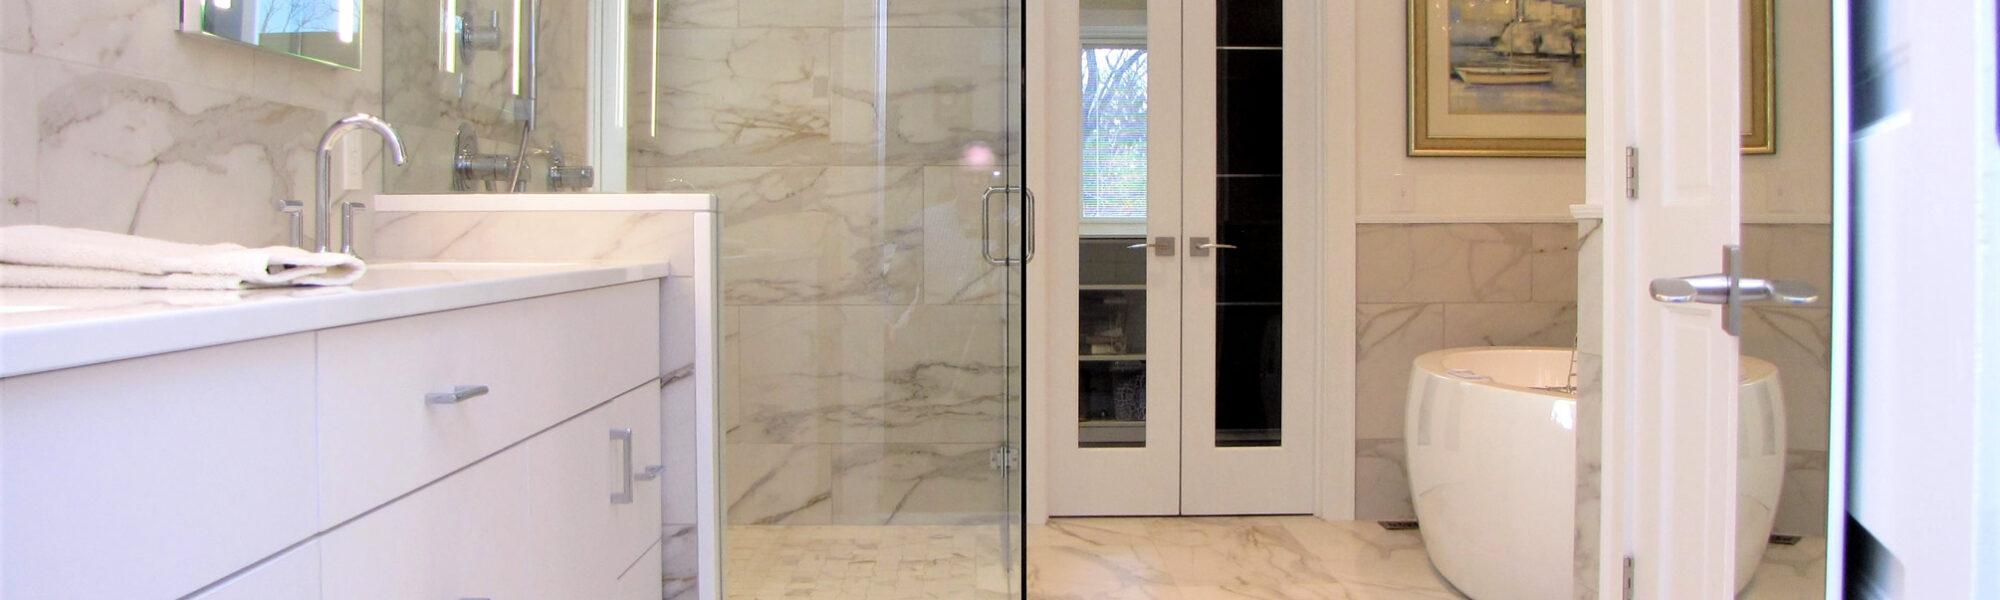 Bath Remodel - Walk-in-shower